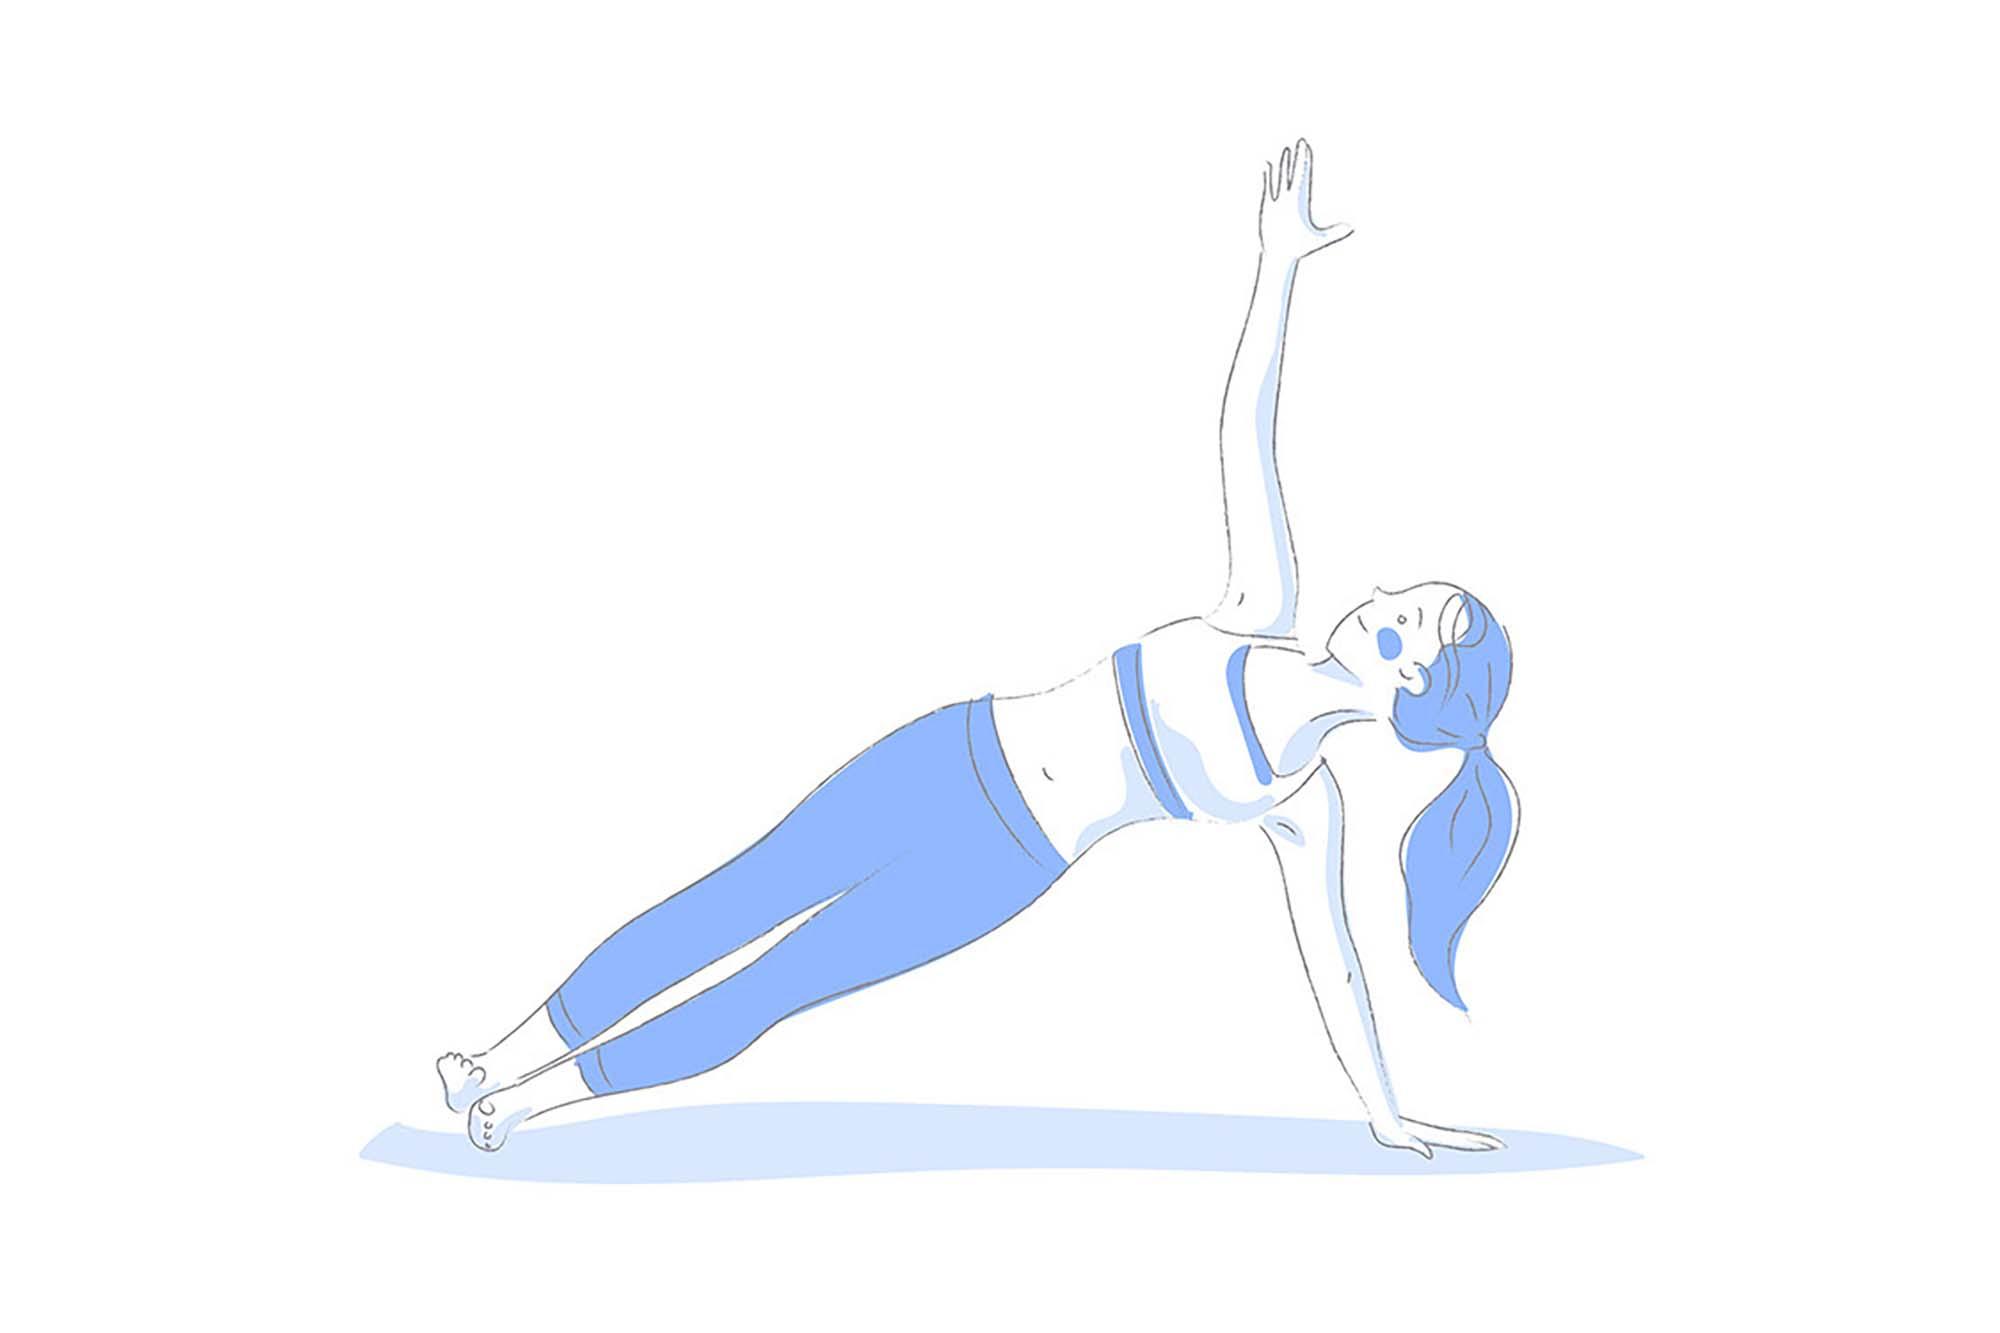 Yoga Poses Illustrations 4